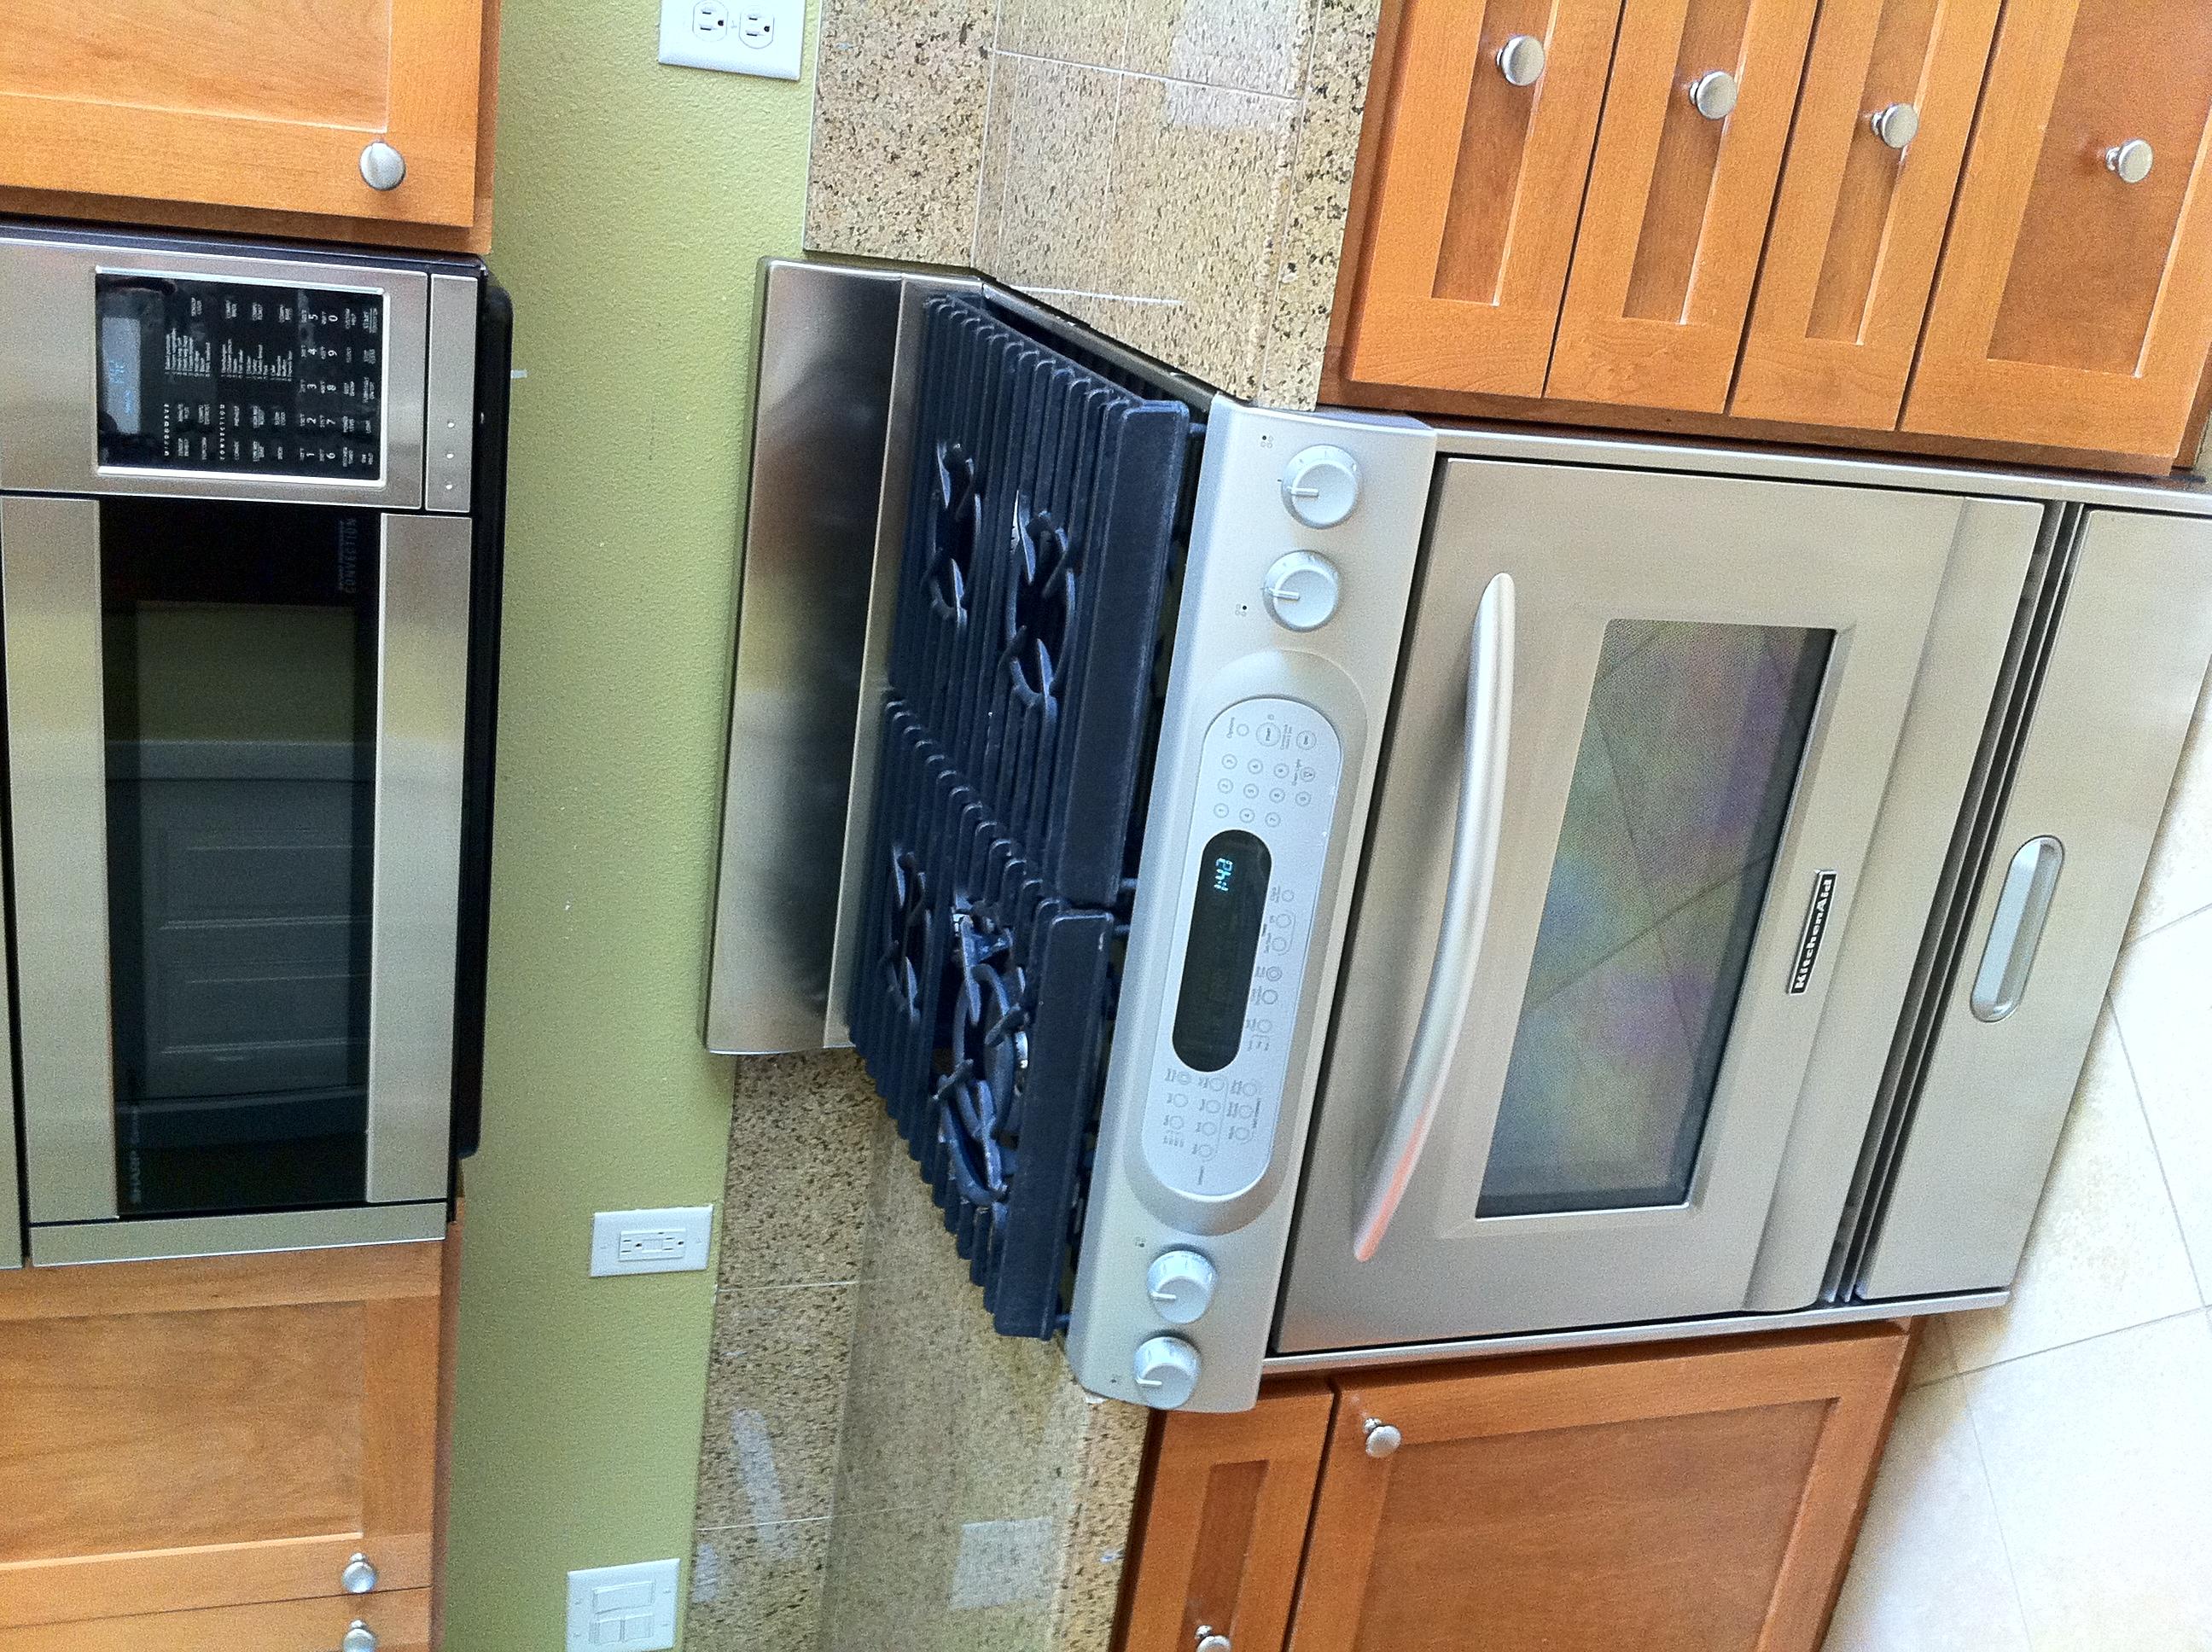 Kitchen Aid Range Kerapss Stuck Key Error